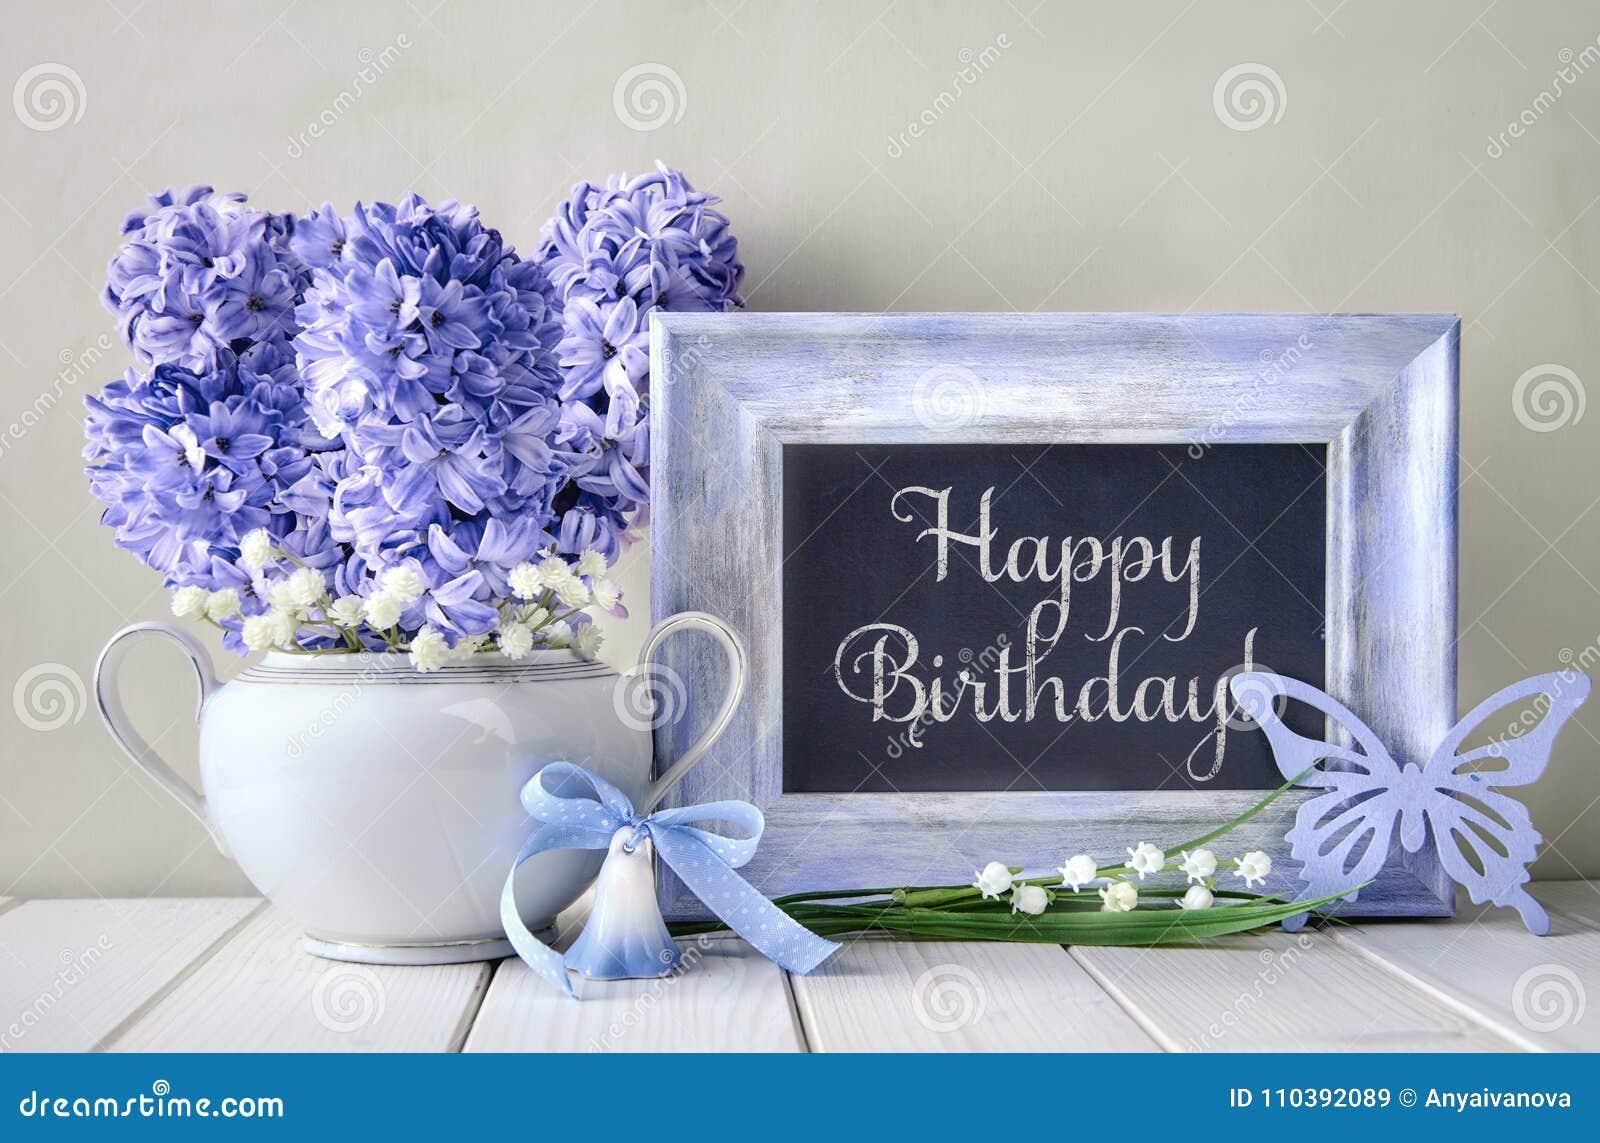 8c61b471a25e Μπλε διακοσμήσεις και λουλούδια υάκινθων στον άσπρο πίνακα